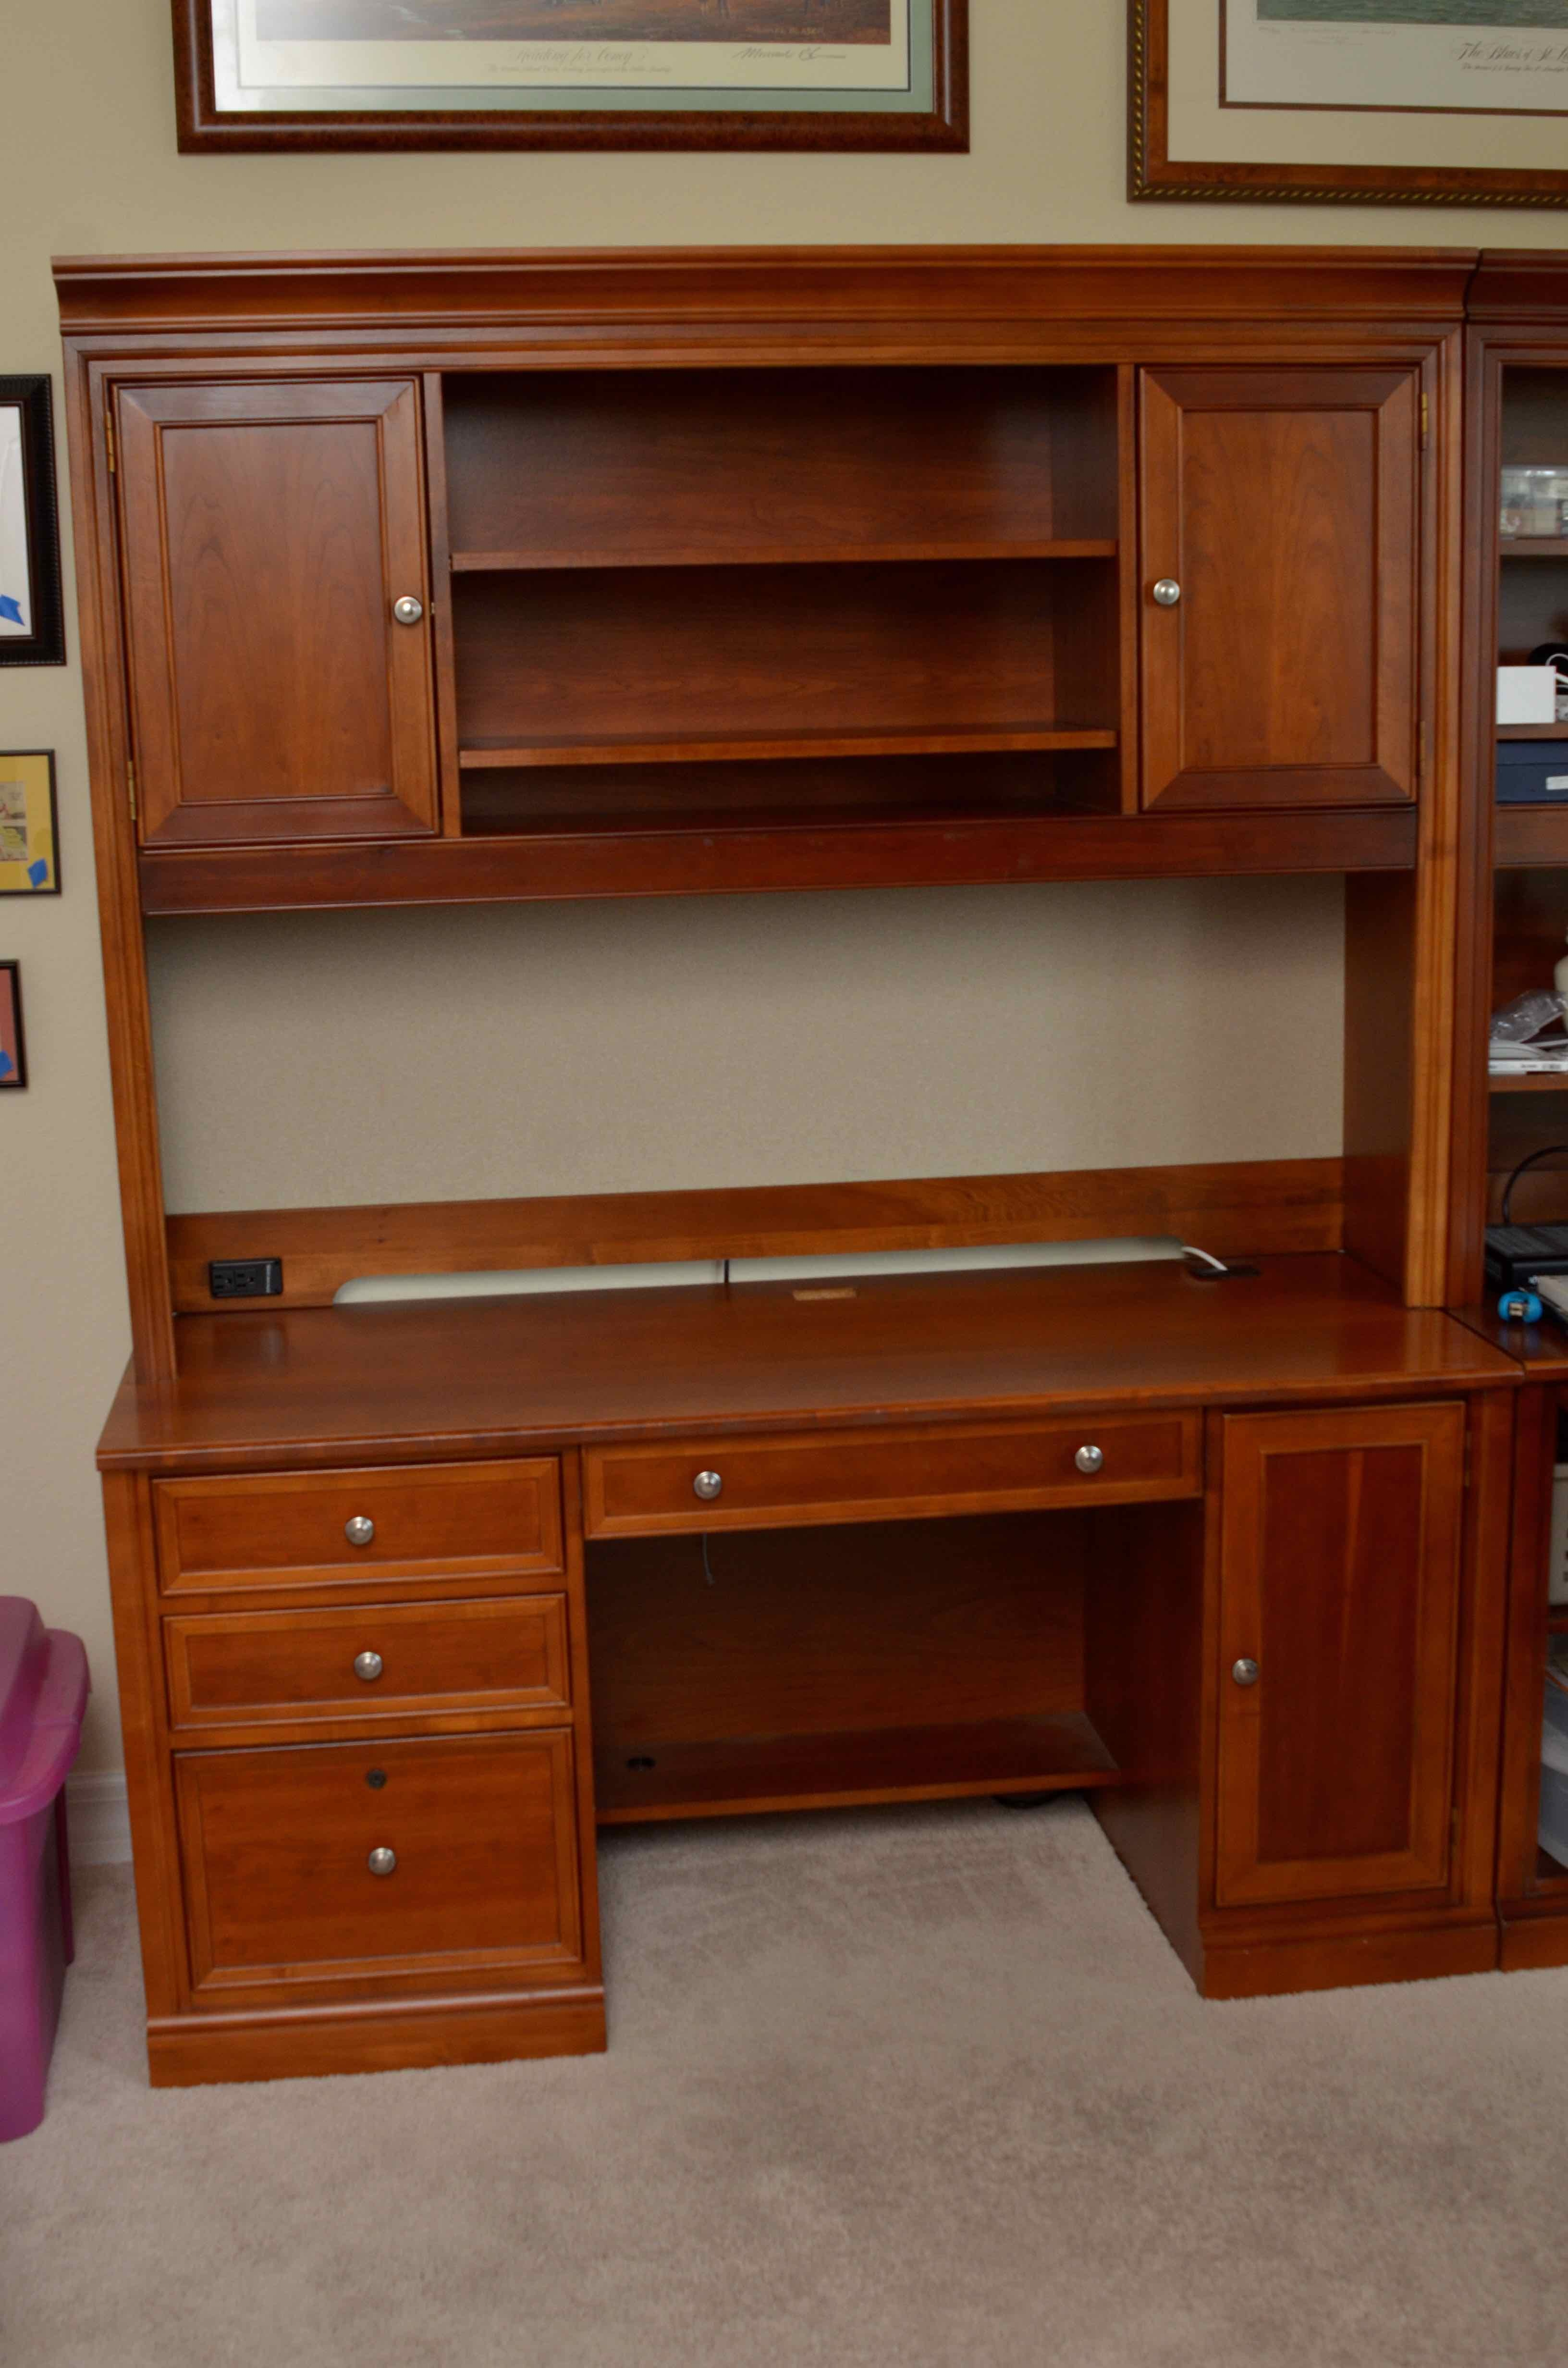 Stanley Furniture Credenza Desk With Hutch Ebth